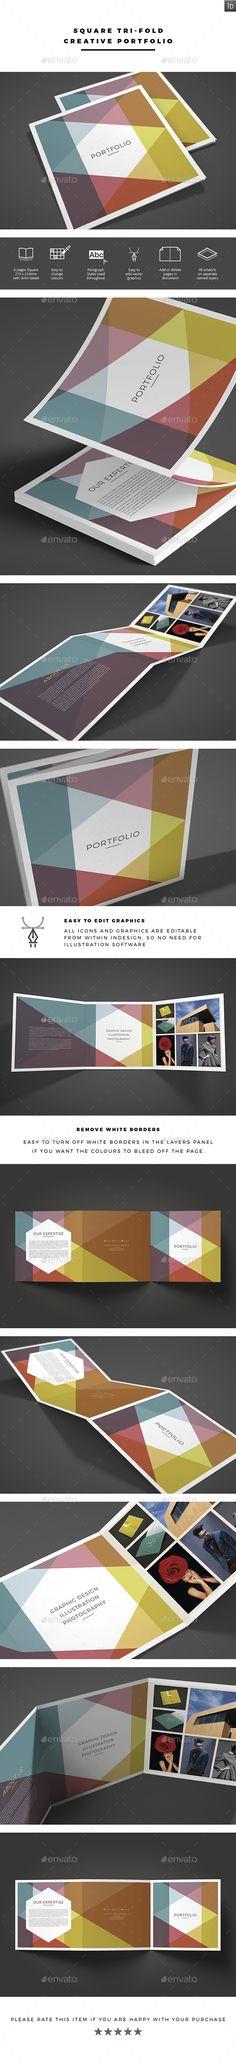 Square Tri-fold Creative Portfolio Brochure Template InDesign INDD. Download here: https://graphicriver.net/item/square-trifold-creative-portfolio/17074211?ref=ksioks